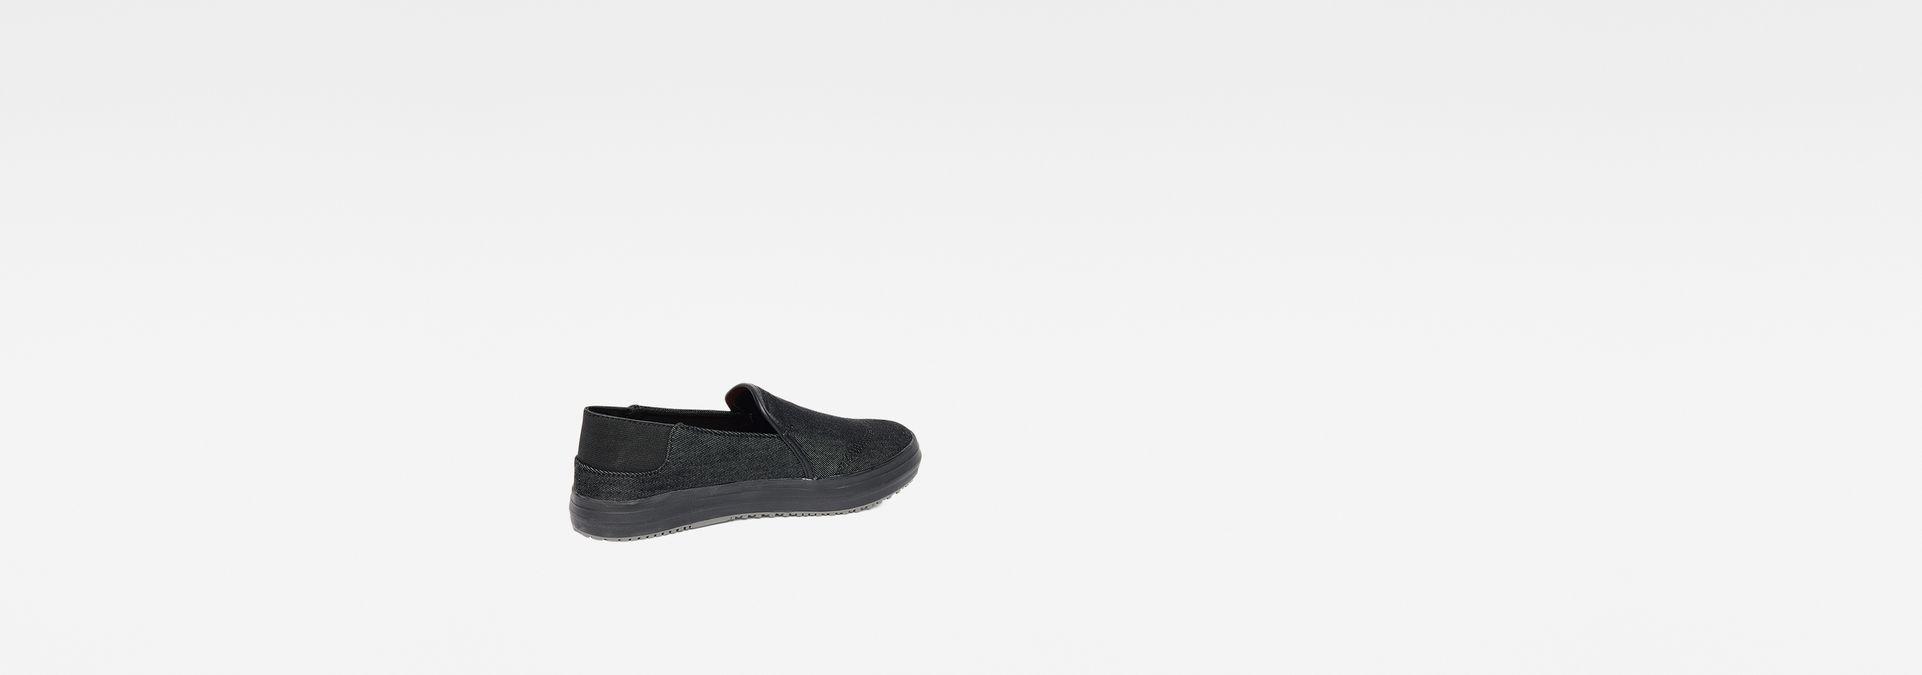 d342dcc2c55 ... G-Star RAW® Kendo Mono Slip-On Sneakers Black model